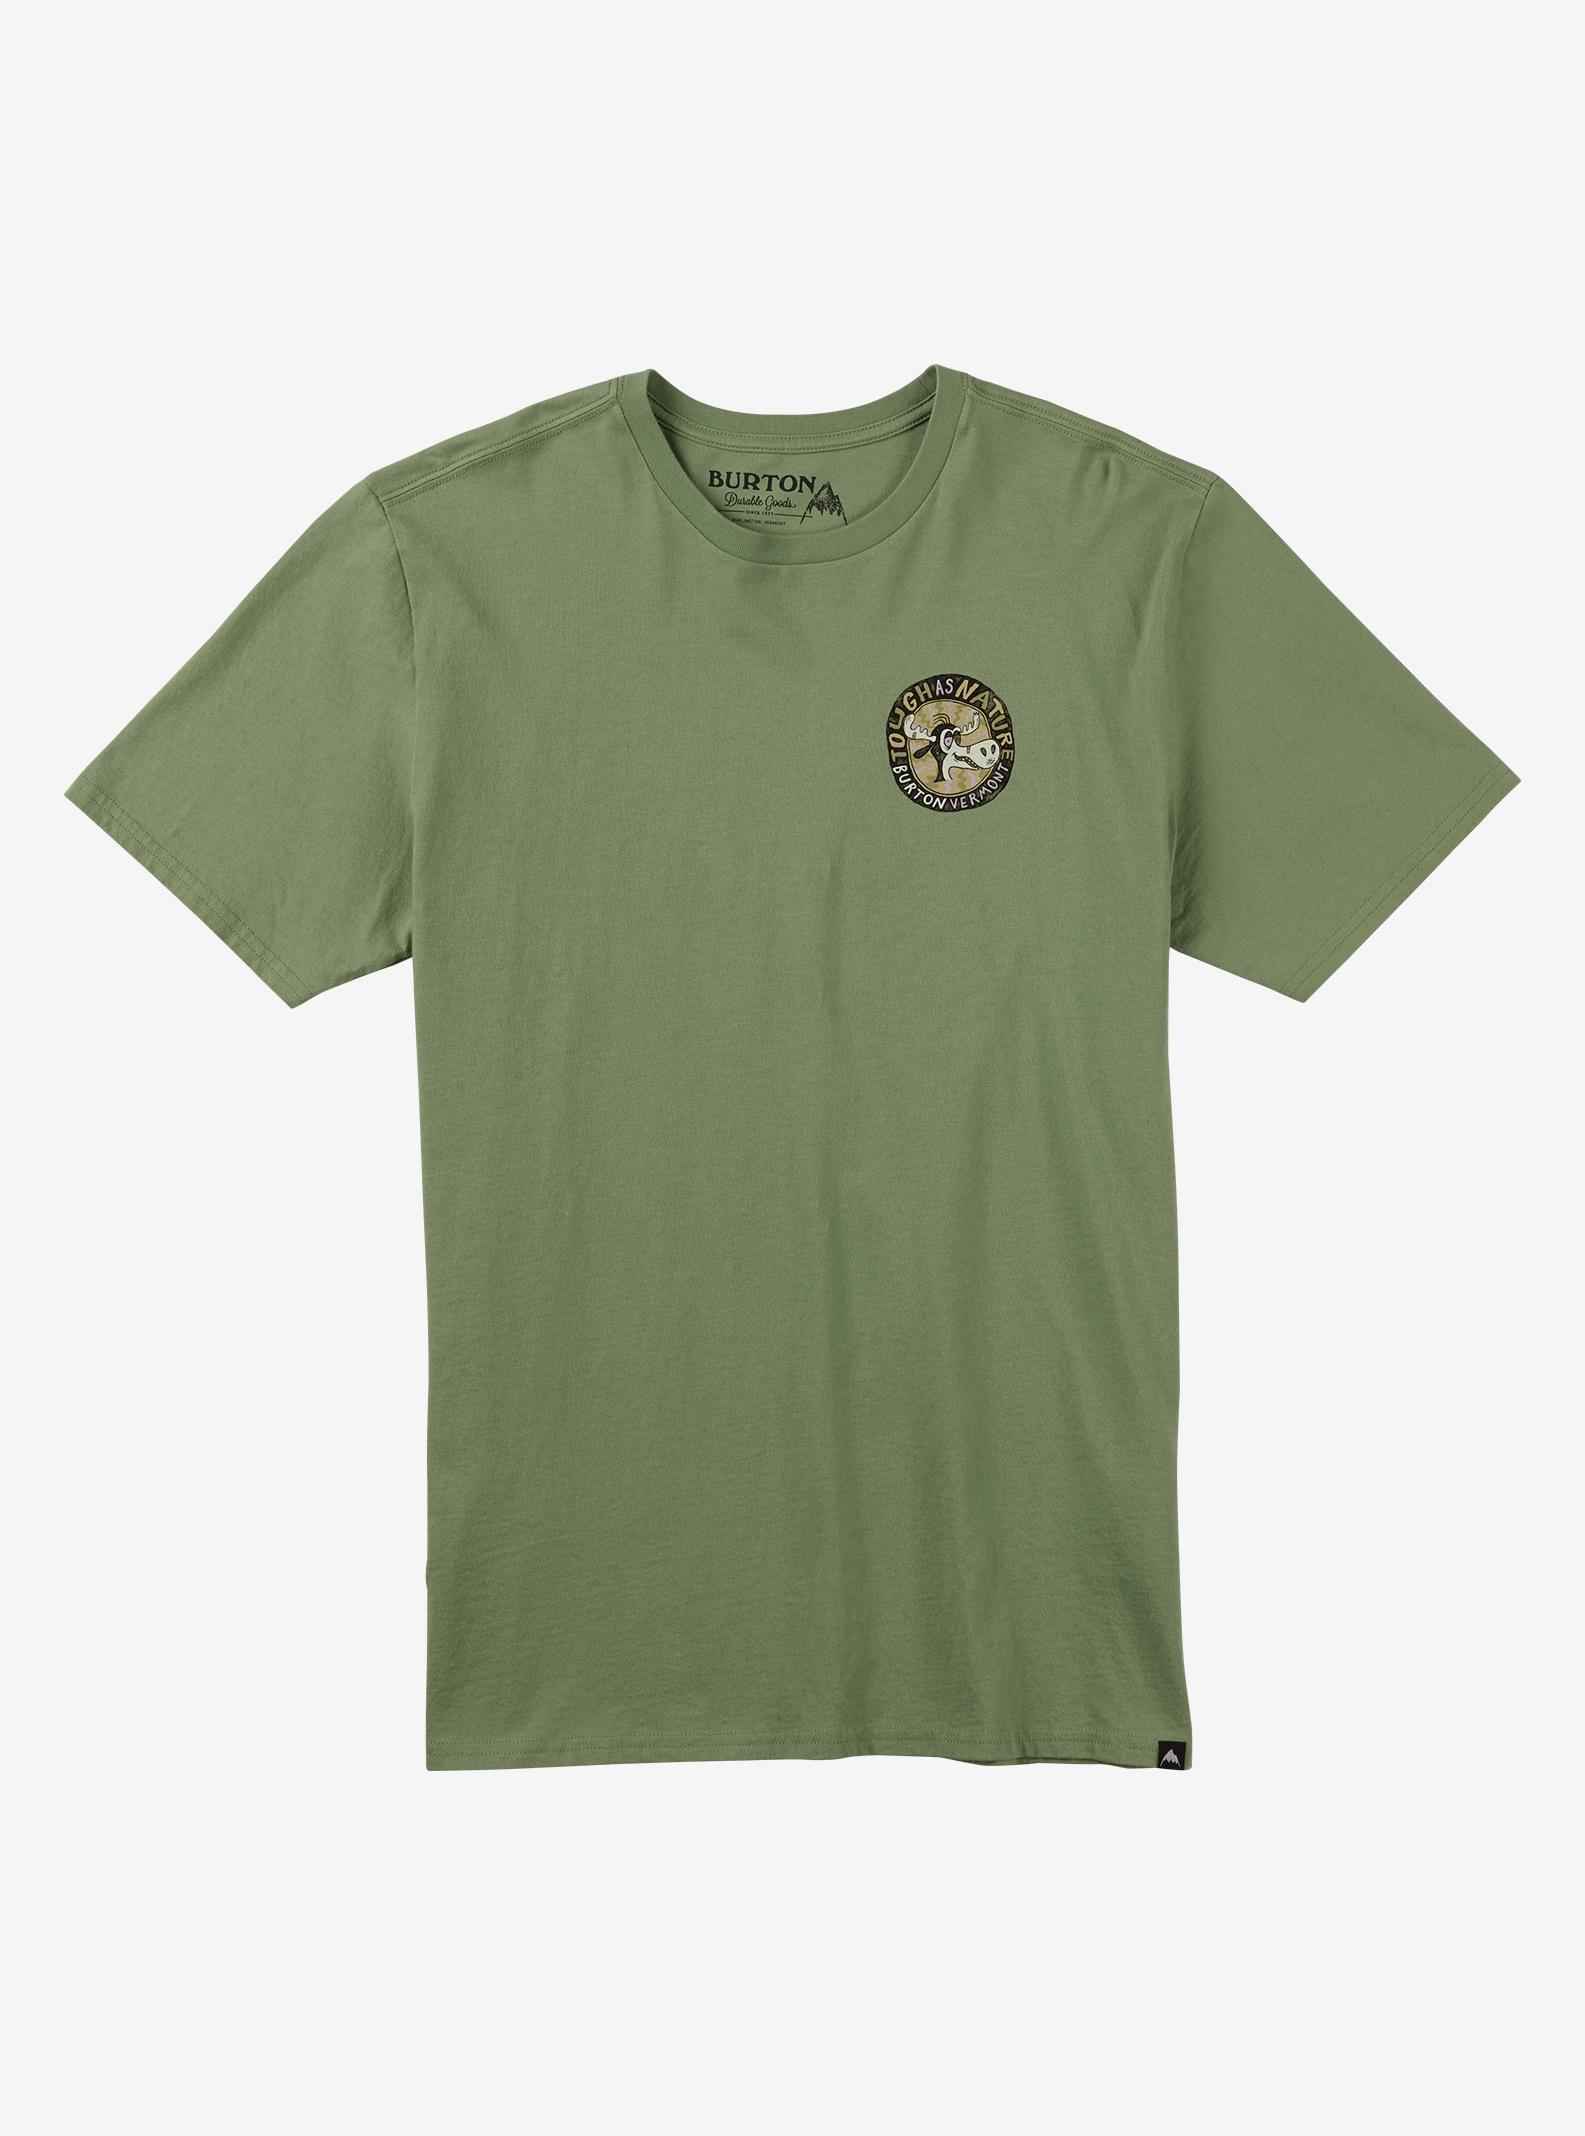 Burton Tough as Nature Short Sleeve T Shirt shown in Grass Green